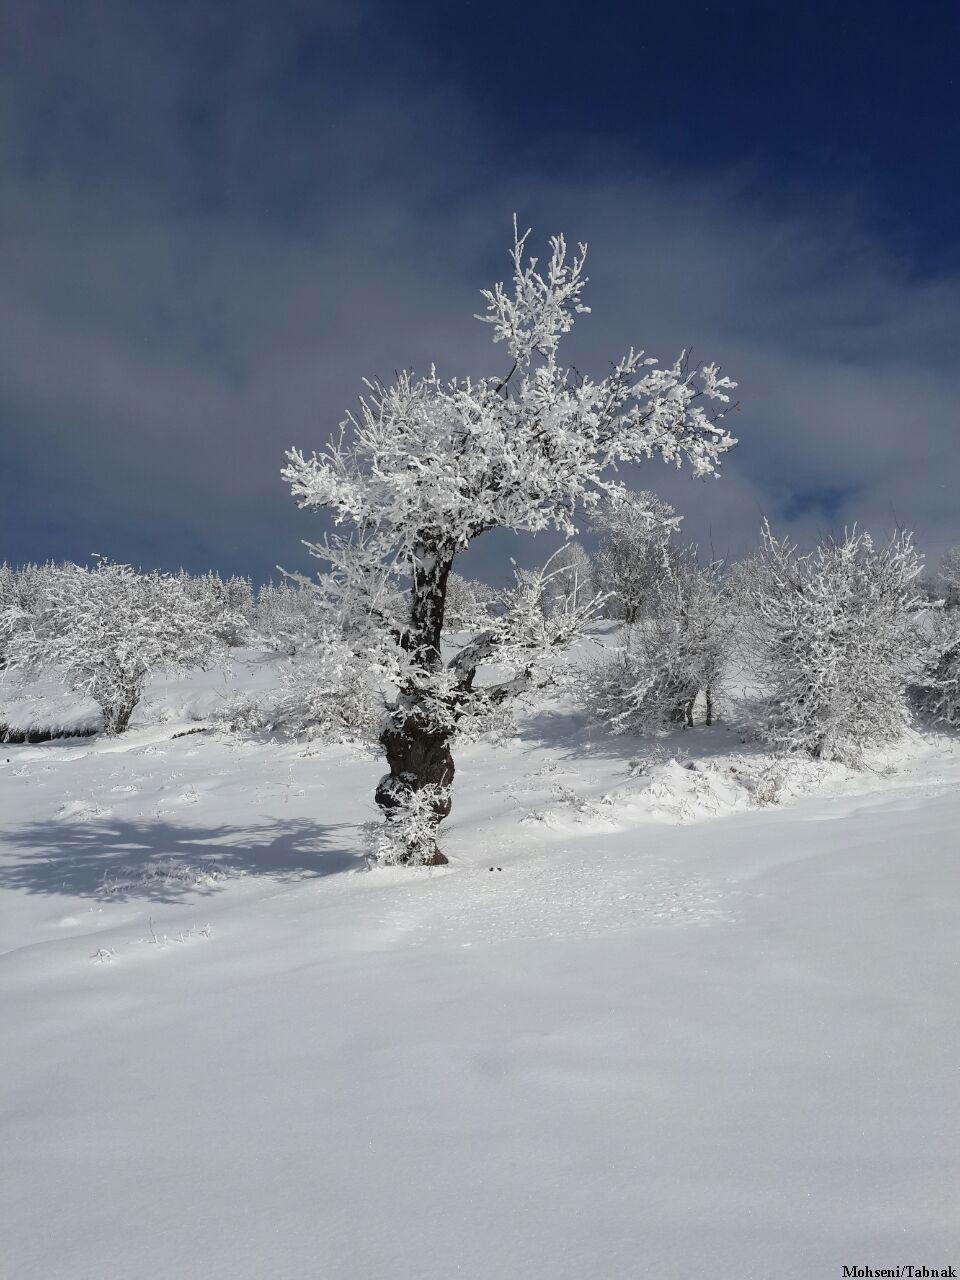 جنگل توسکا چشمه گلوگاه, مازندران